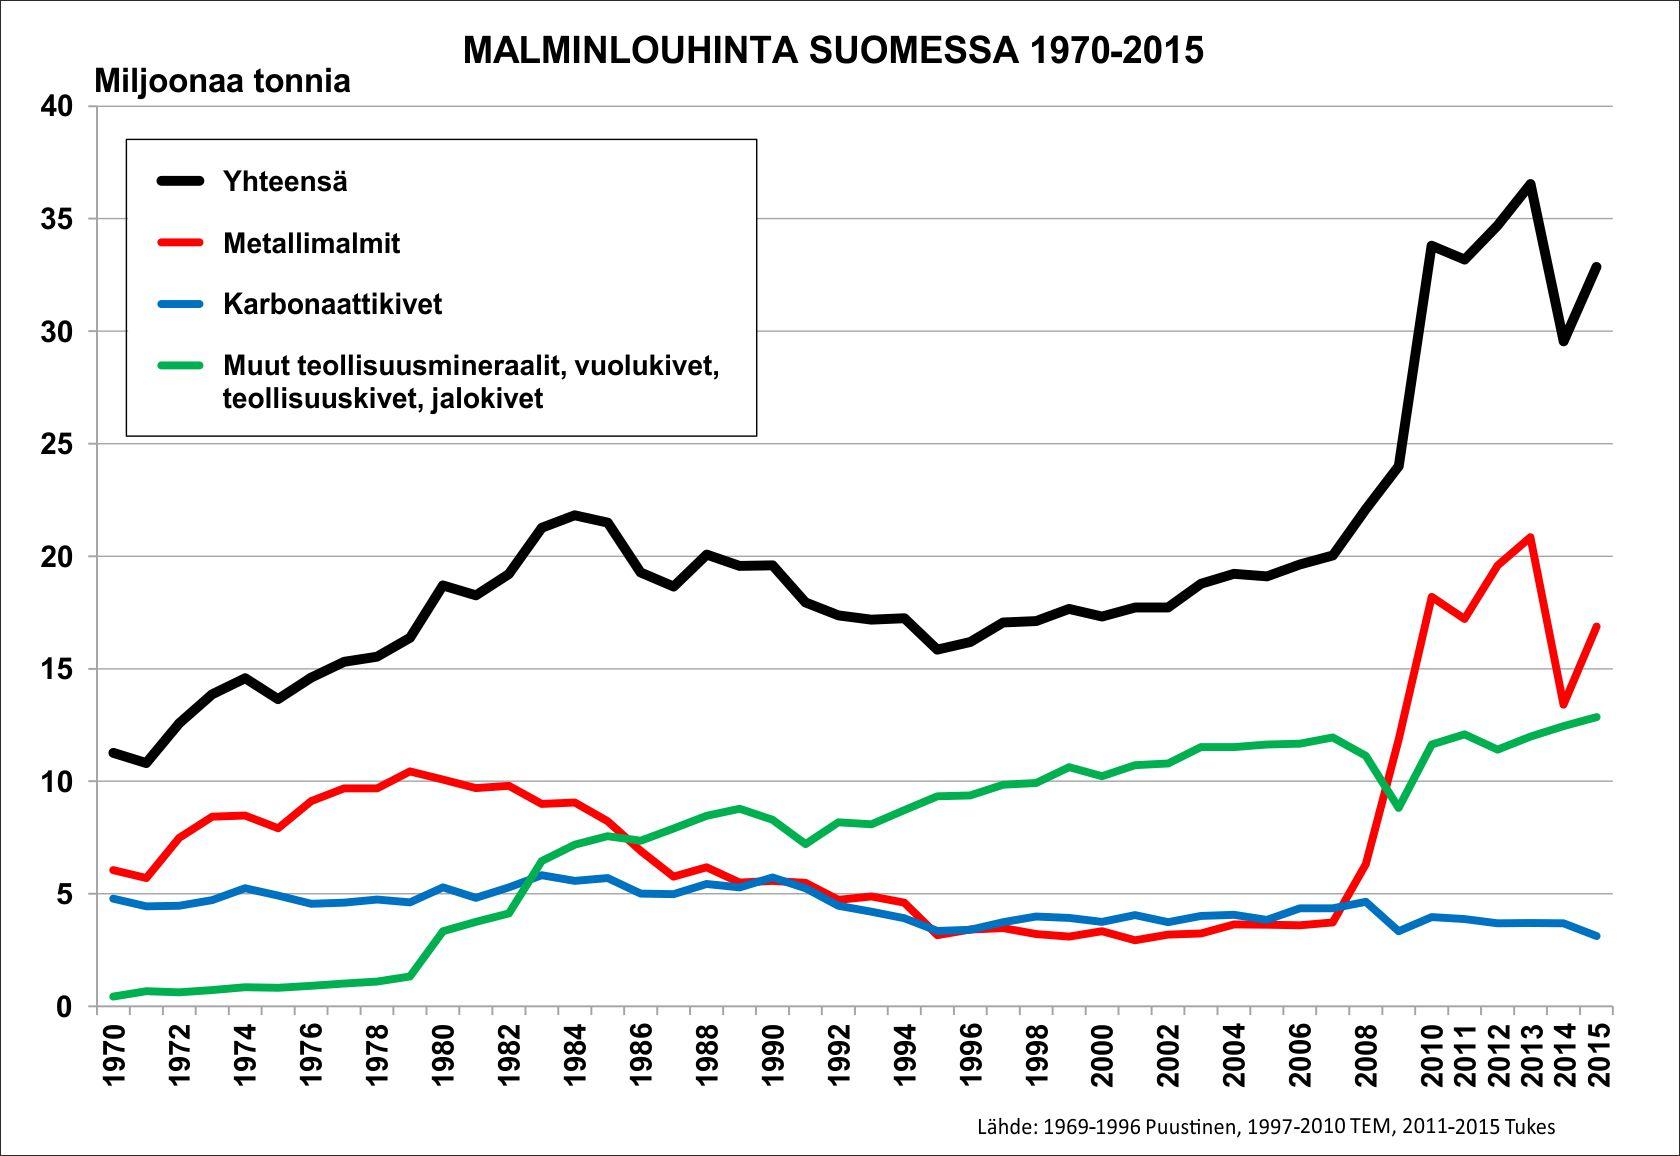 Suomen Malmikaivokset